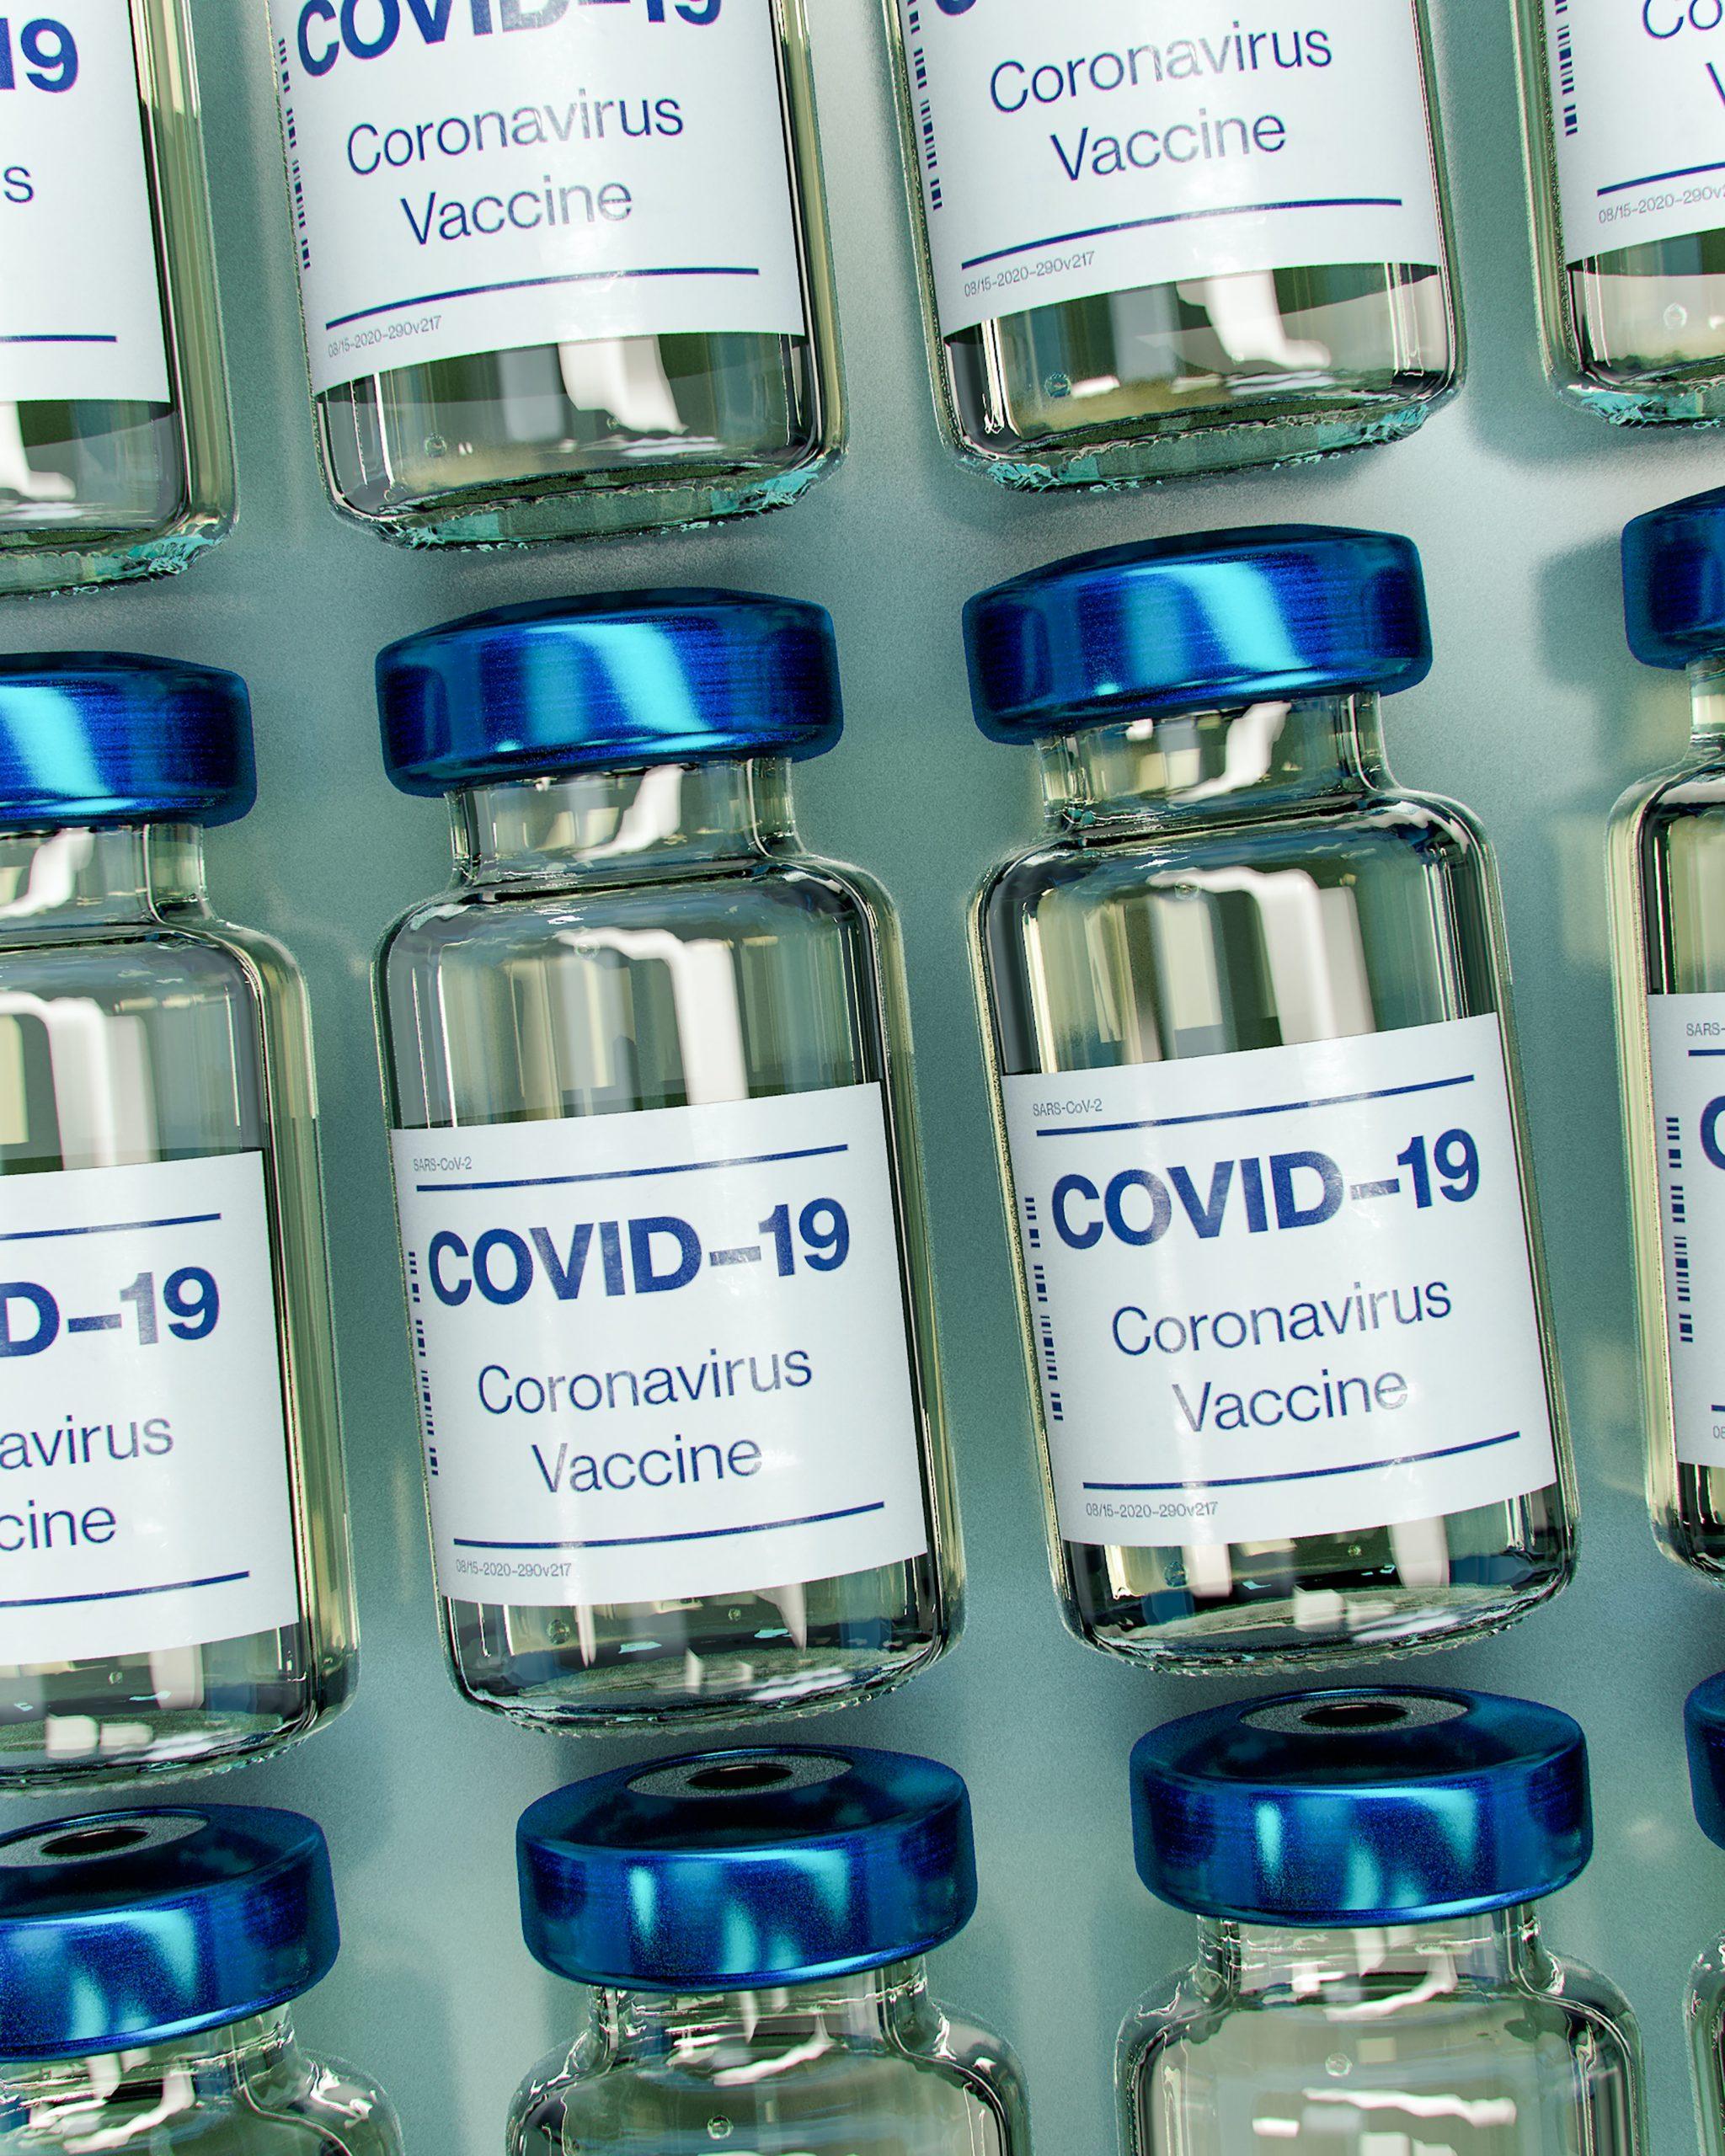 Covid-19 vaccination, Coronavirus Vaccine